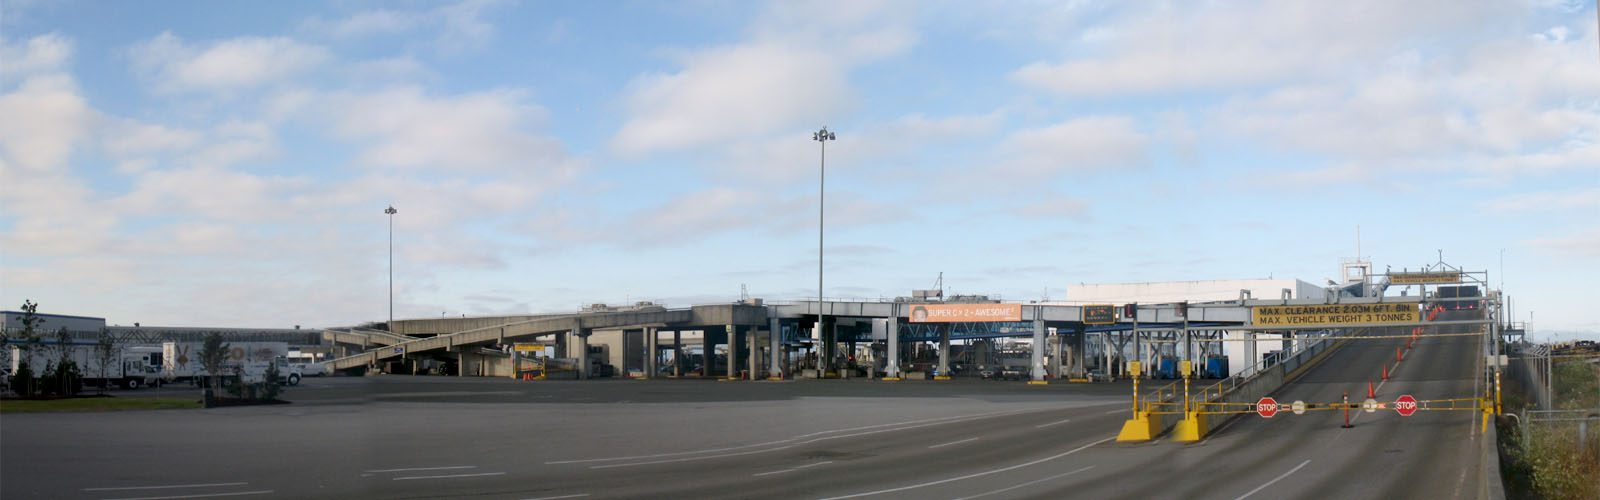 Tsawwassen - BC Ferries Loading Dock -liver (Mark Ruthenberg)